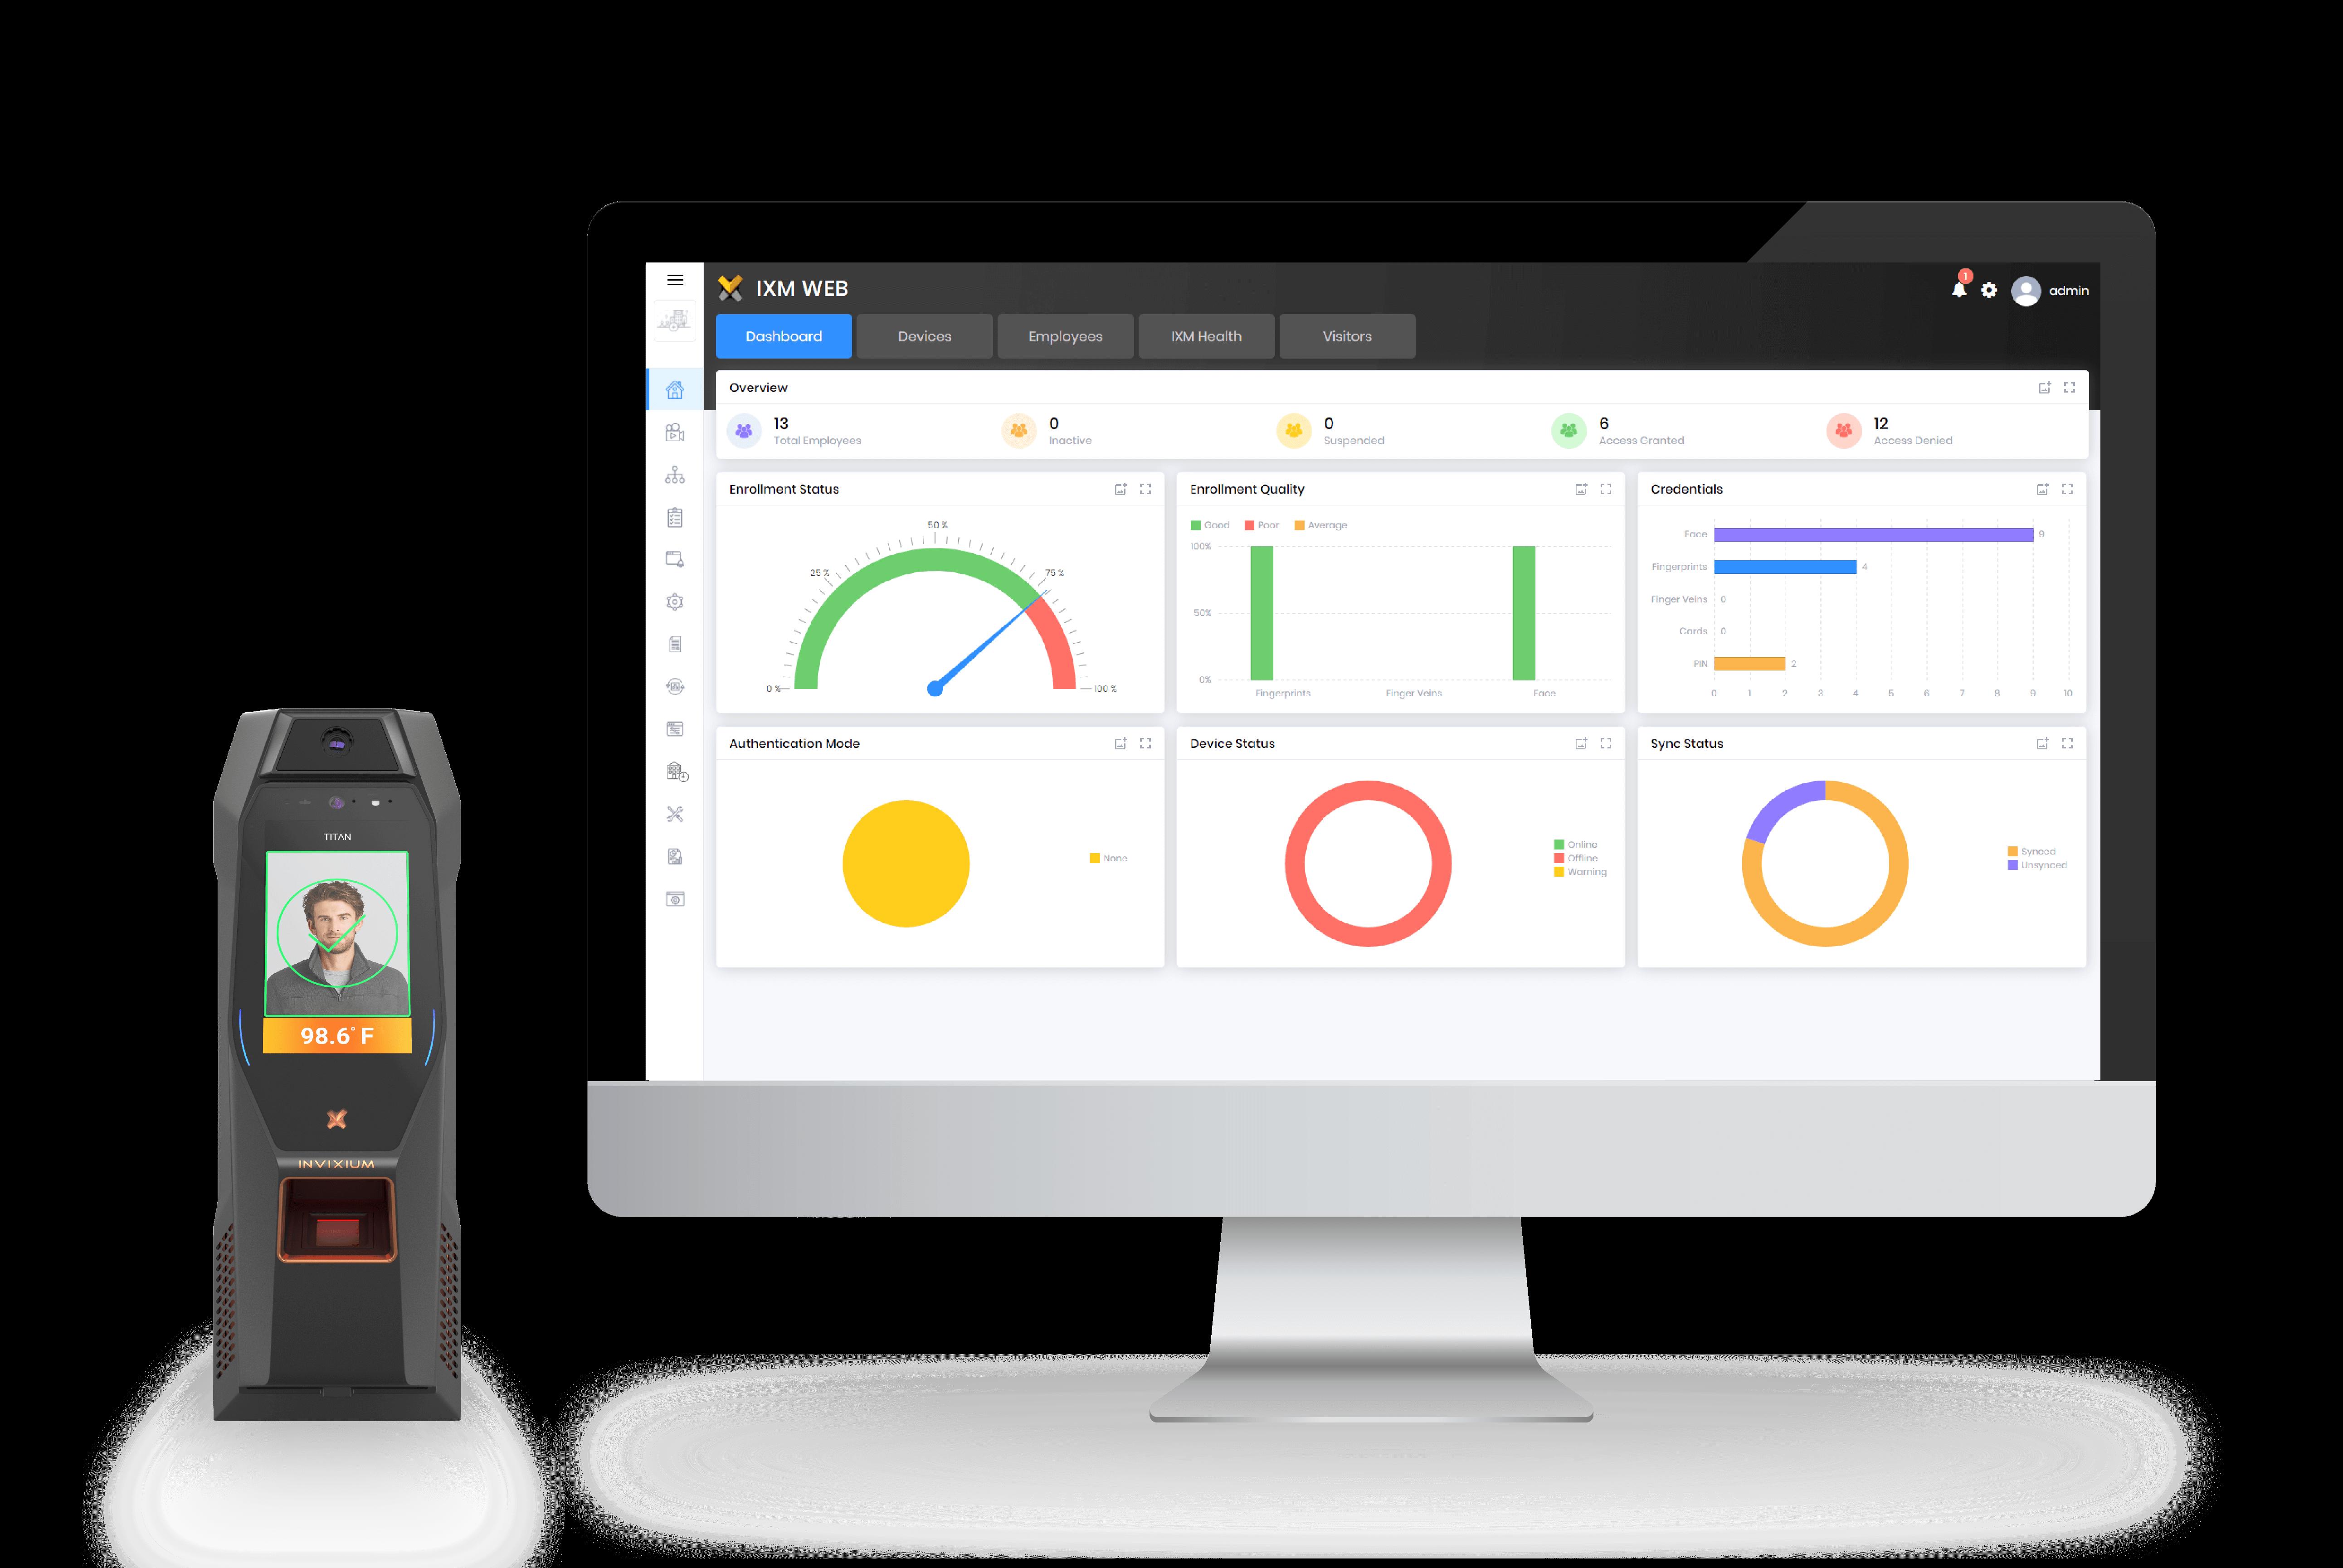 ixm web dashboard software